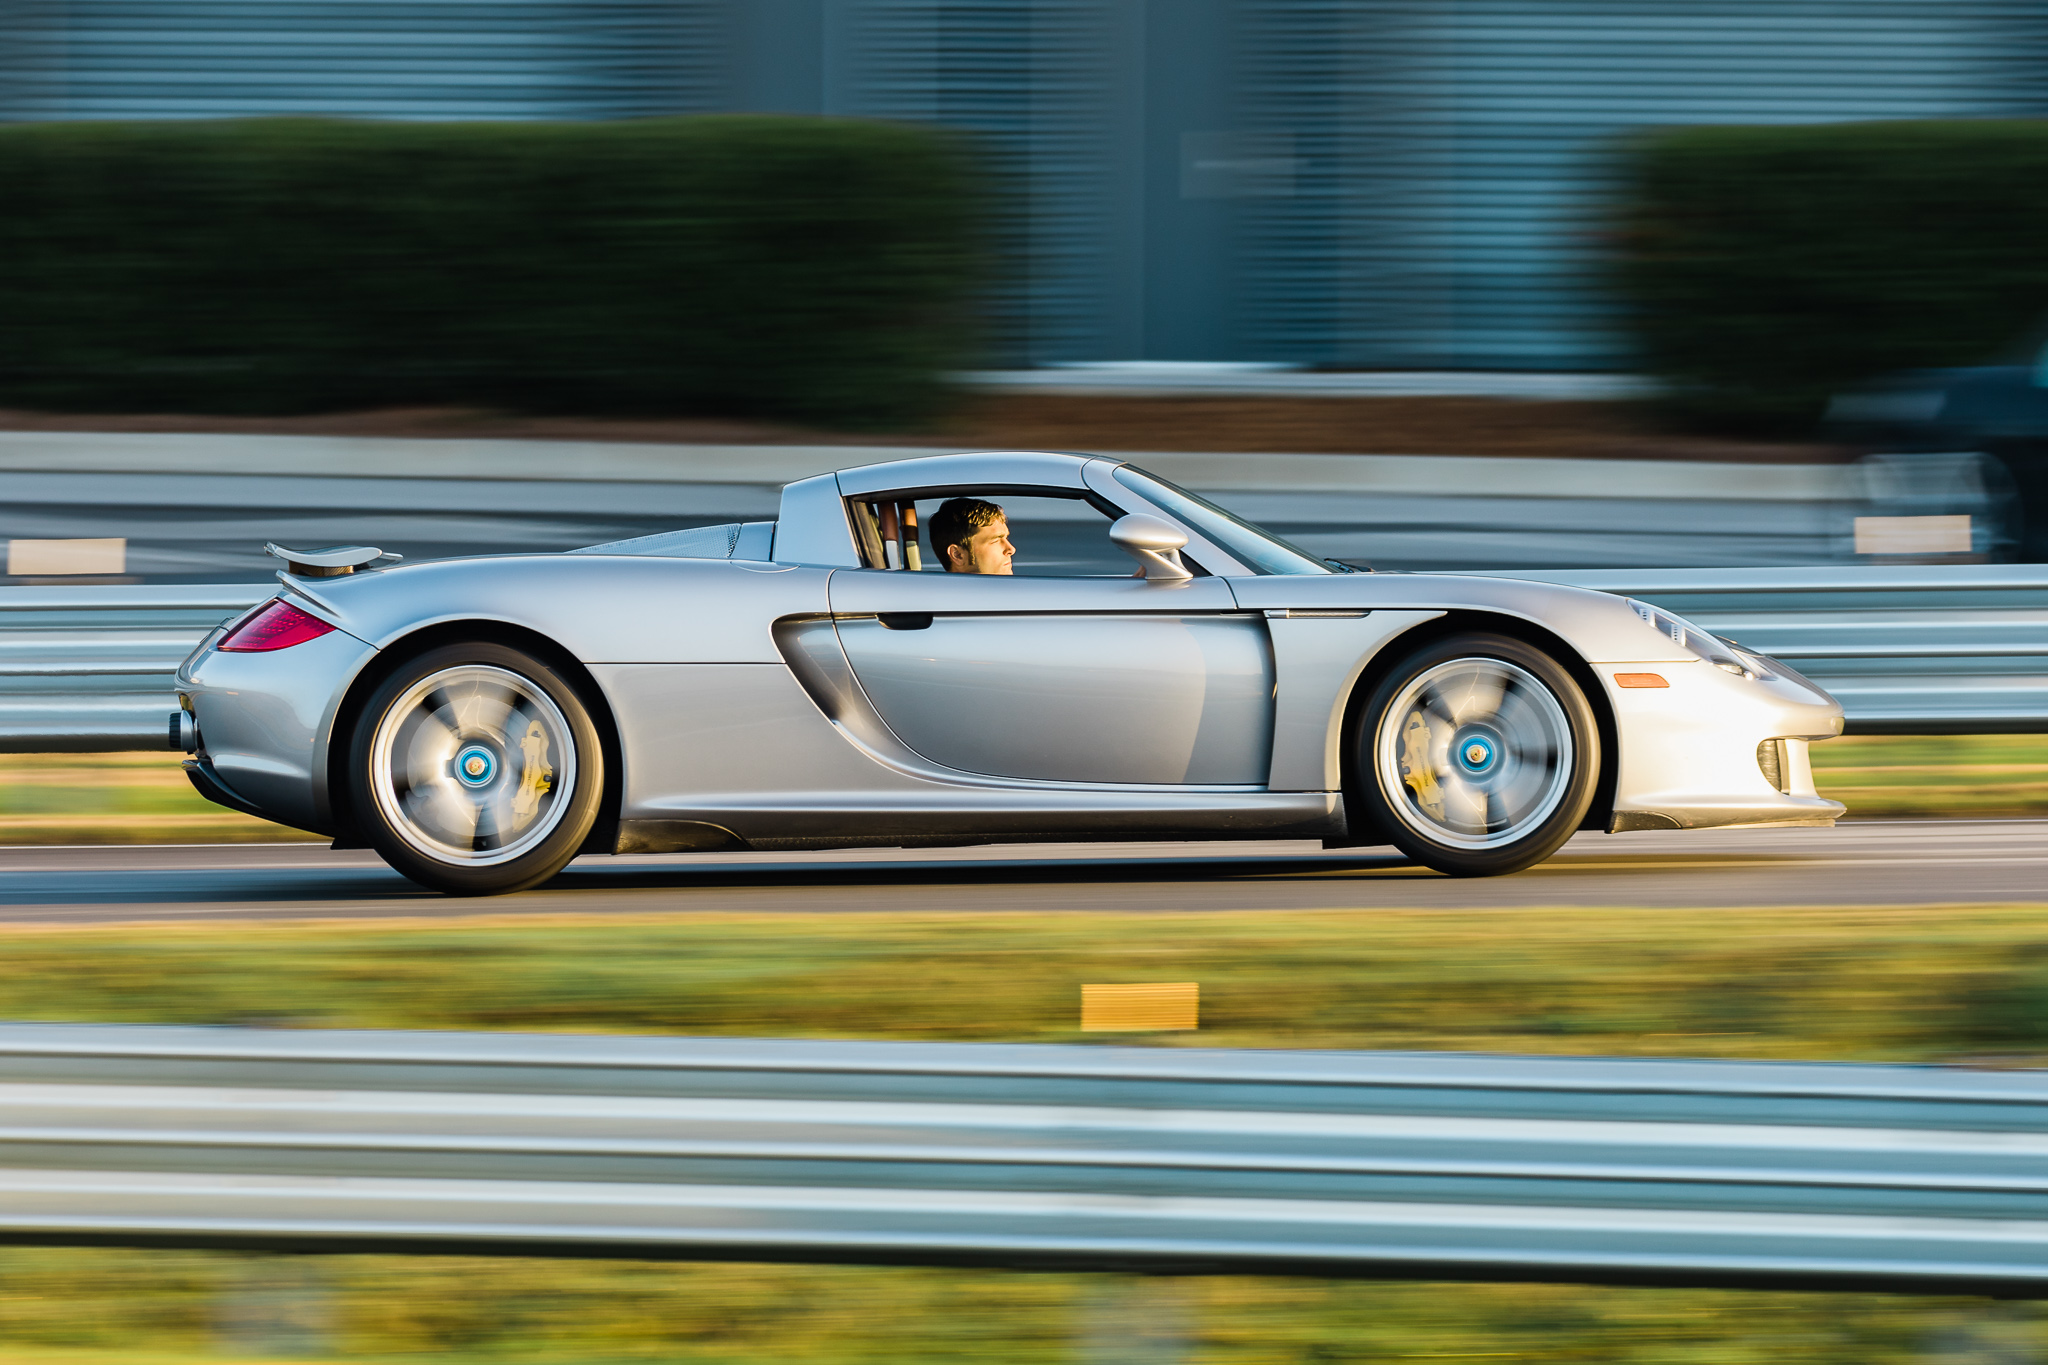 Porsche Carrera GT side profile dynamic action